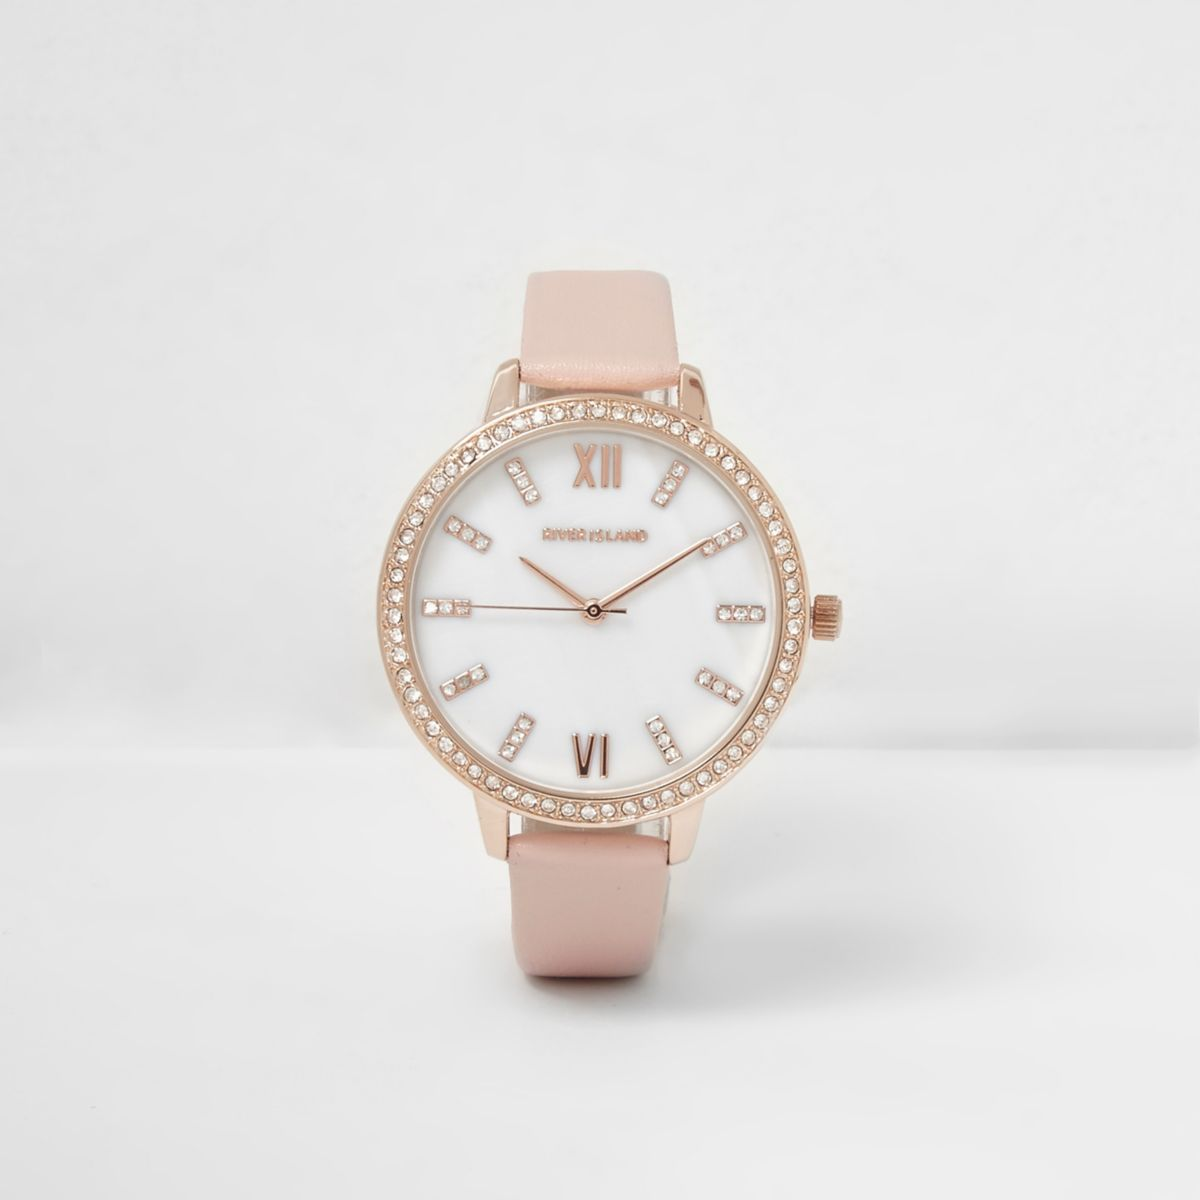 Pink rhinestone encrusted round watch